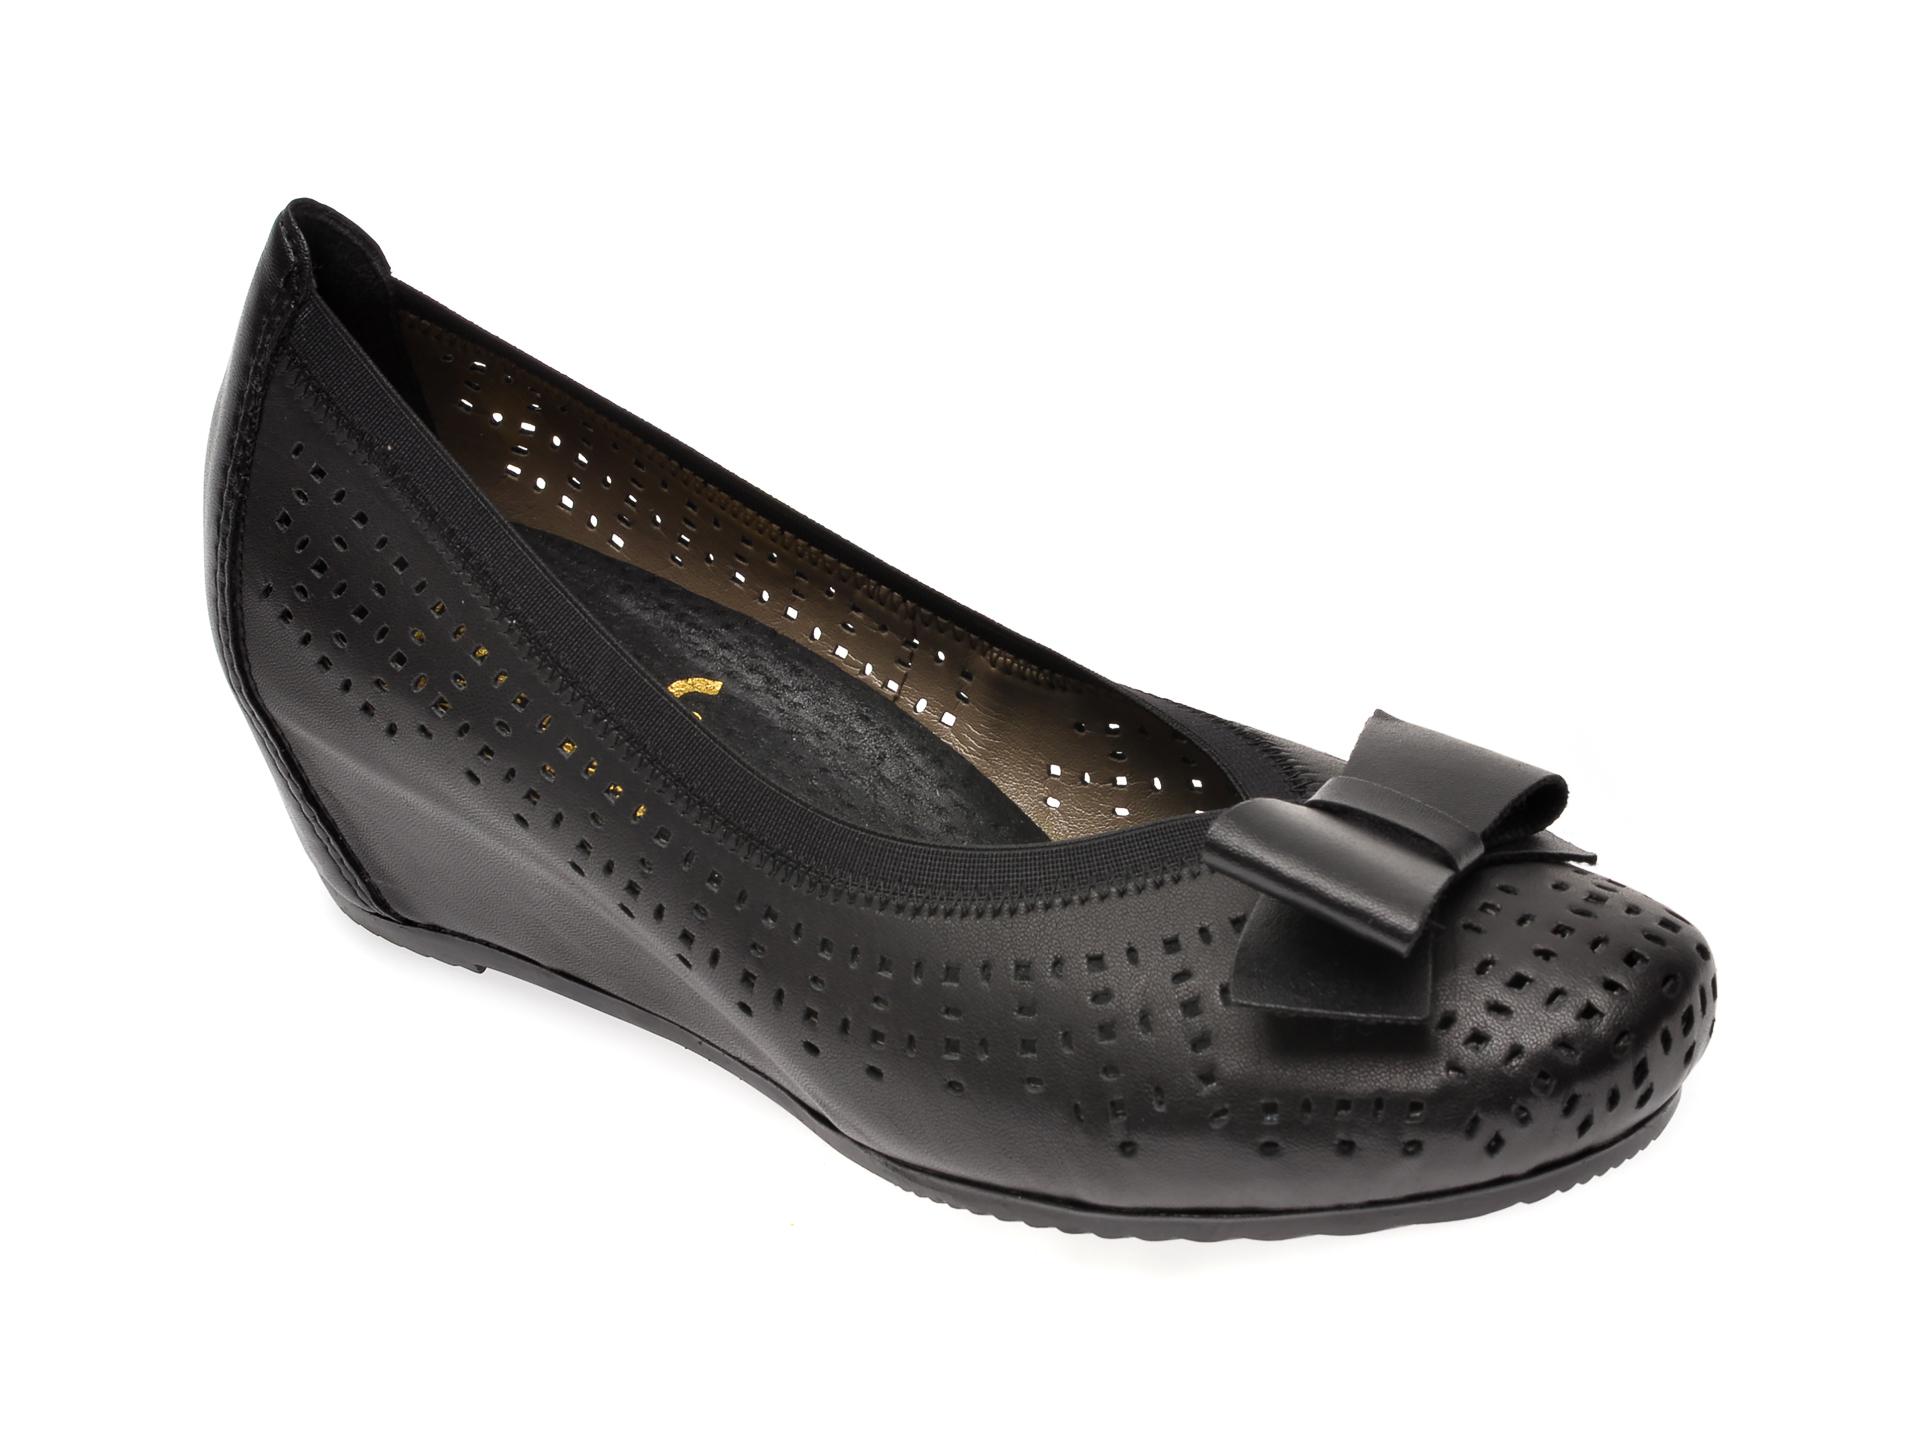 Pantofi RIEKER negri, L4767, din piele naturala